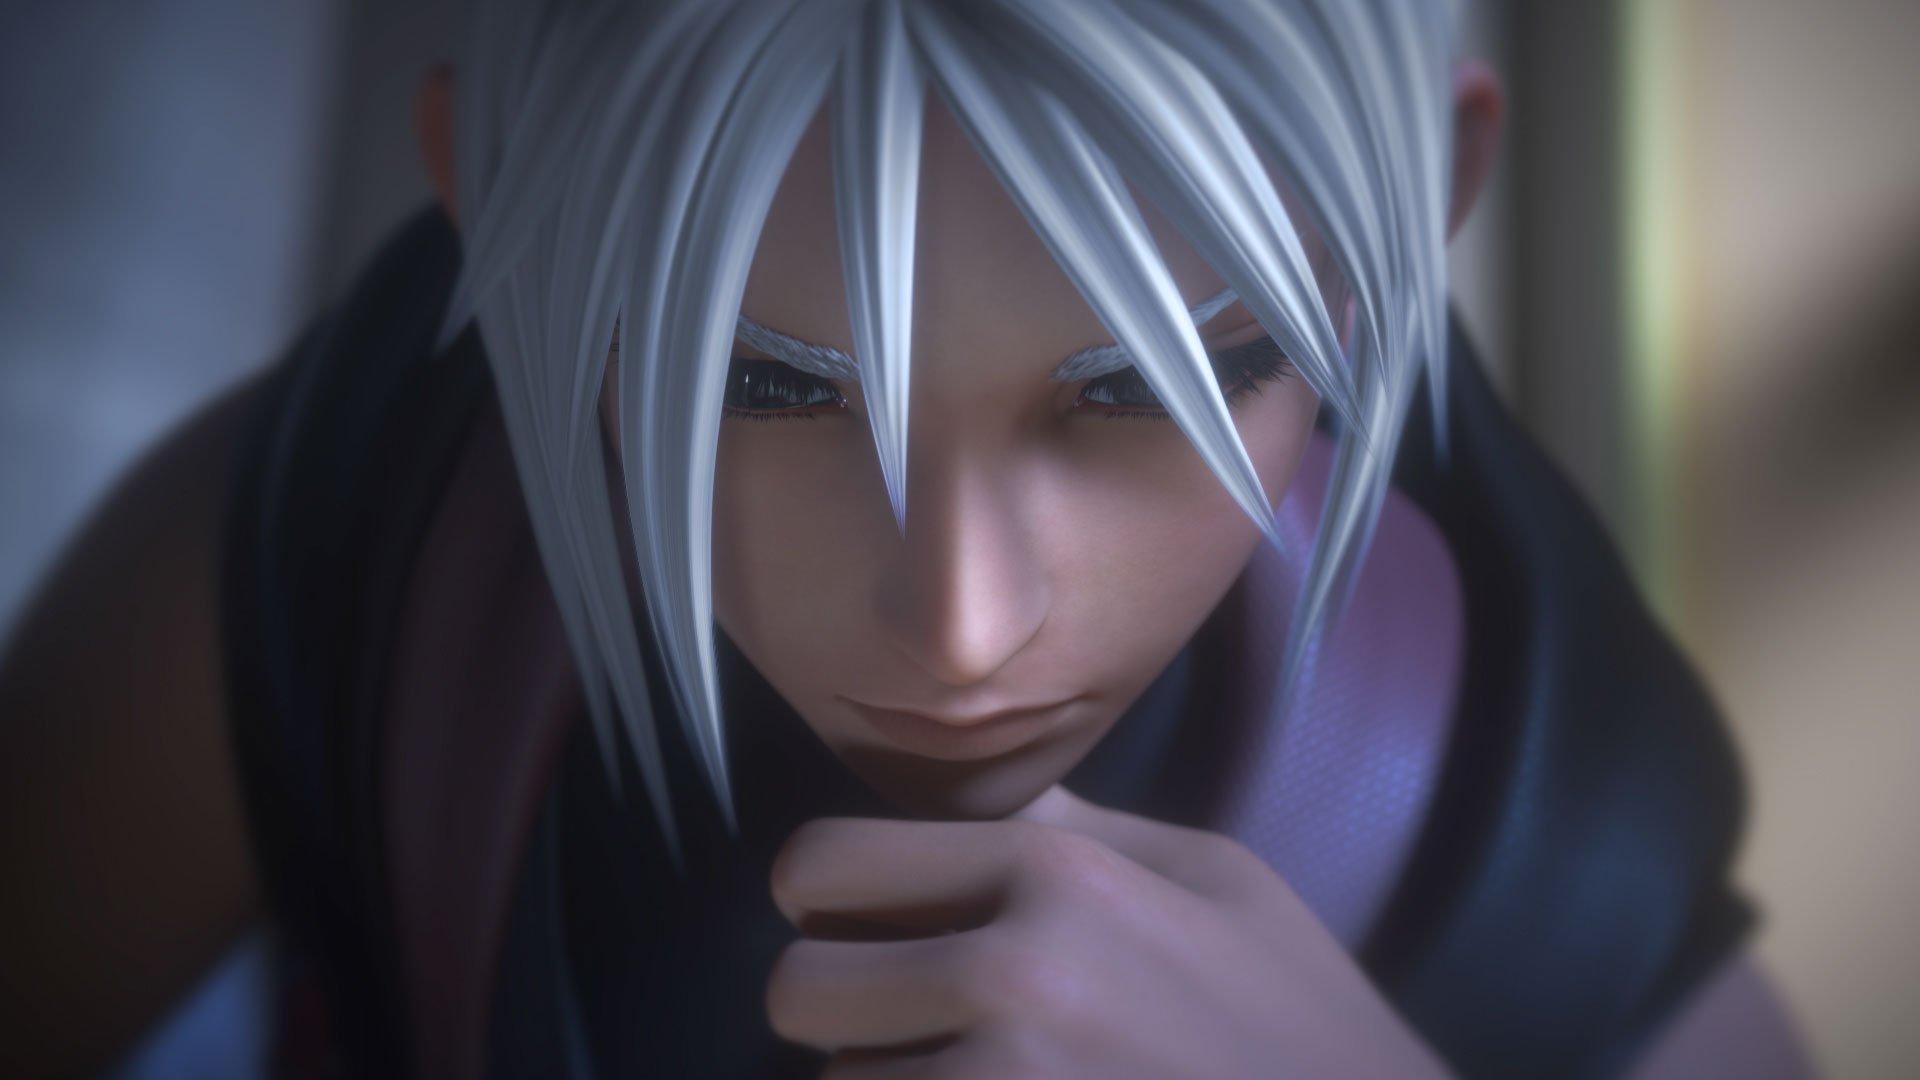 Kingdom Hearts - Project Xehanort